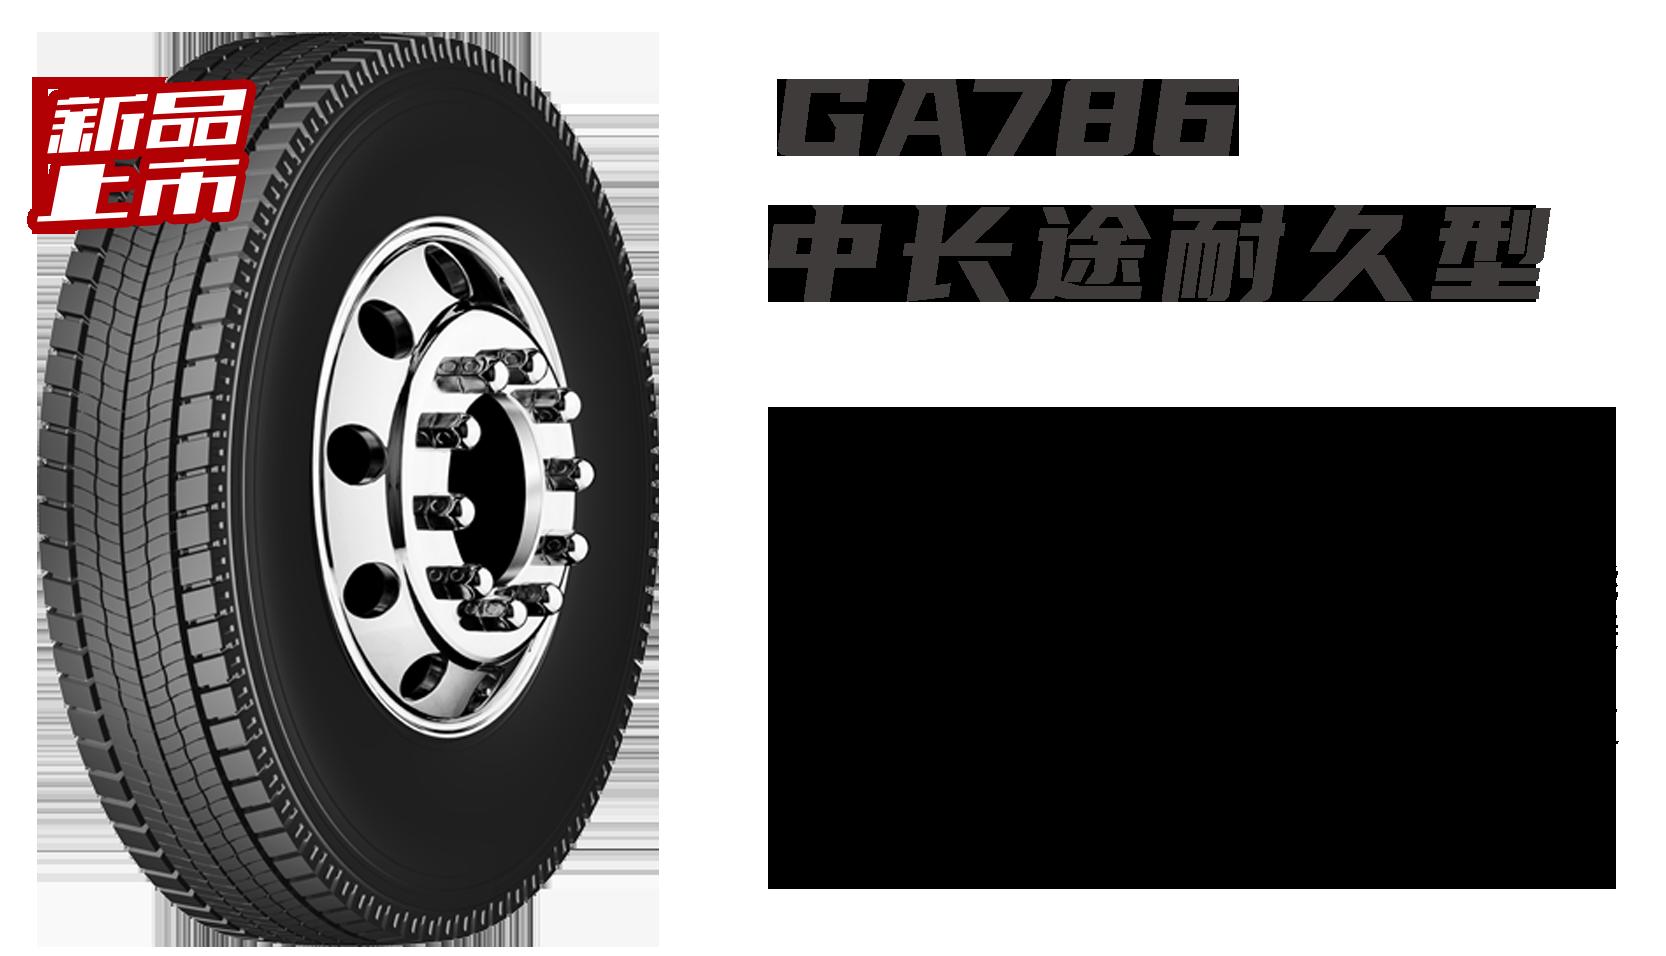 GA 786